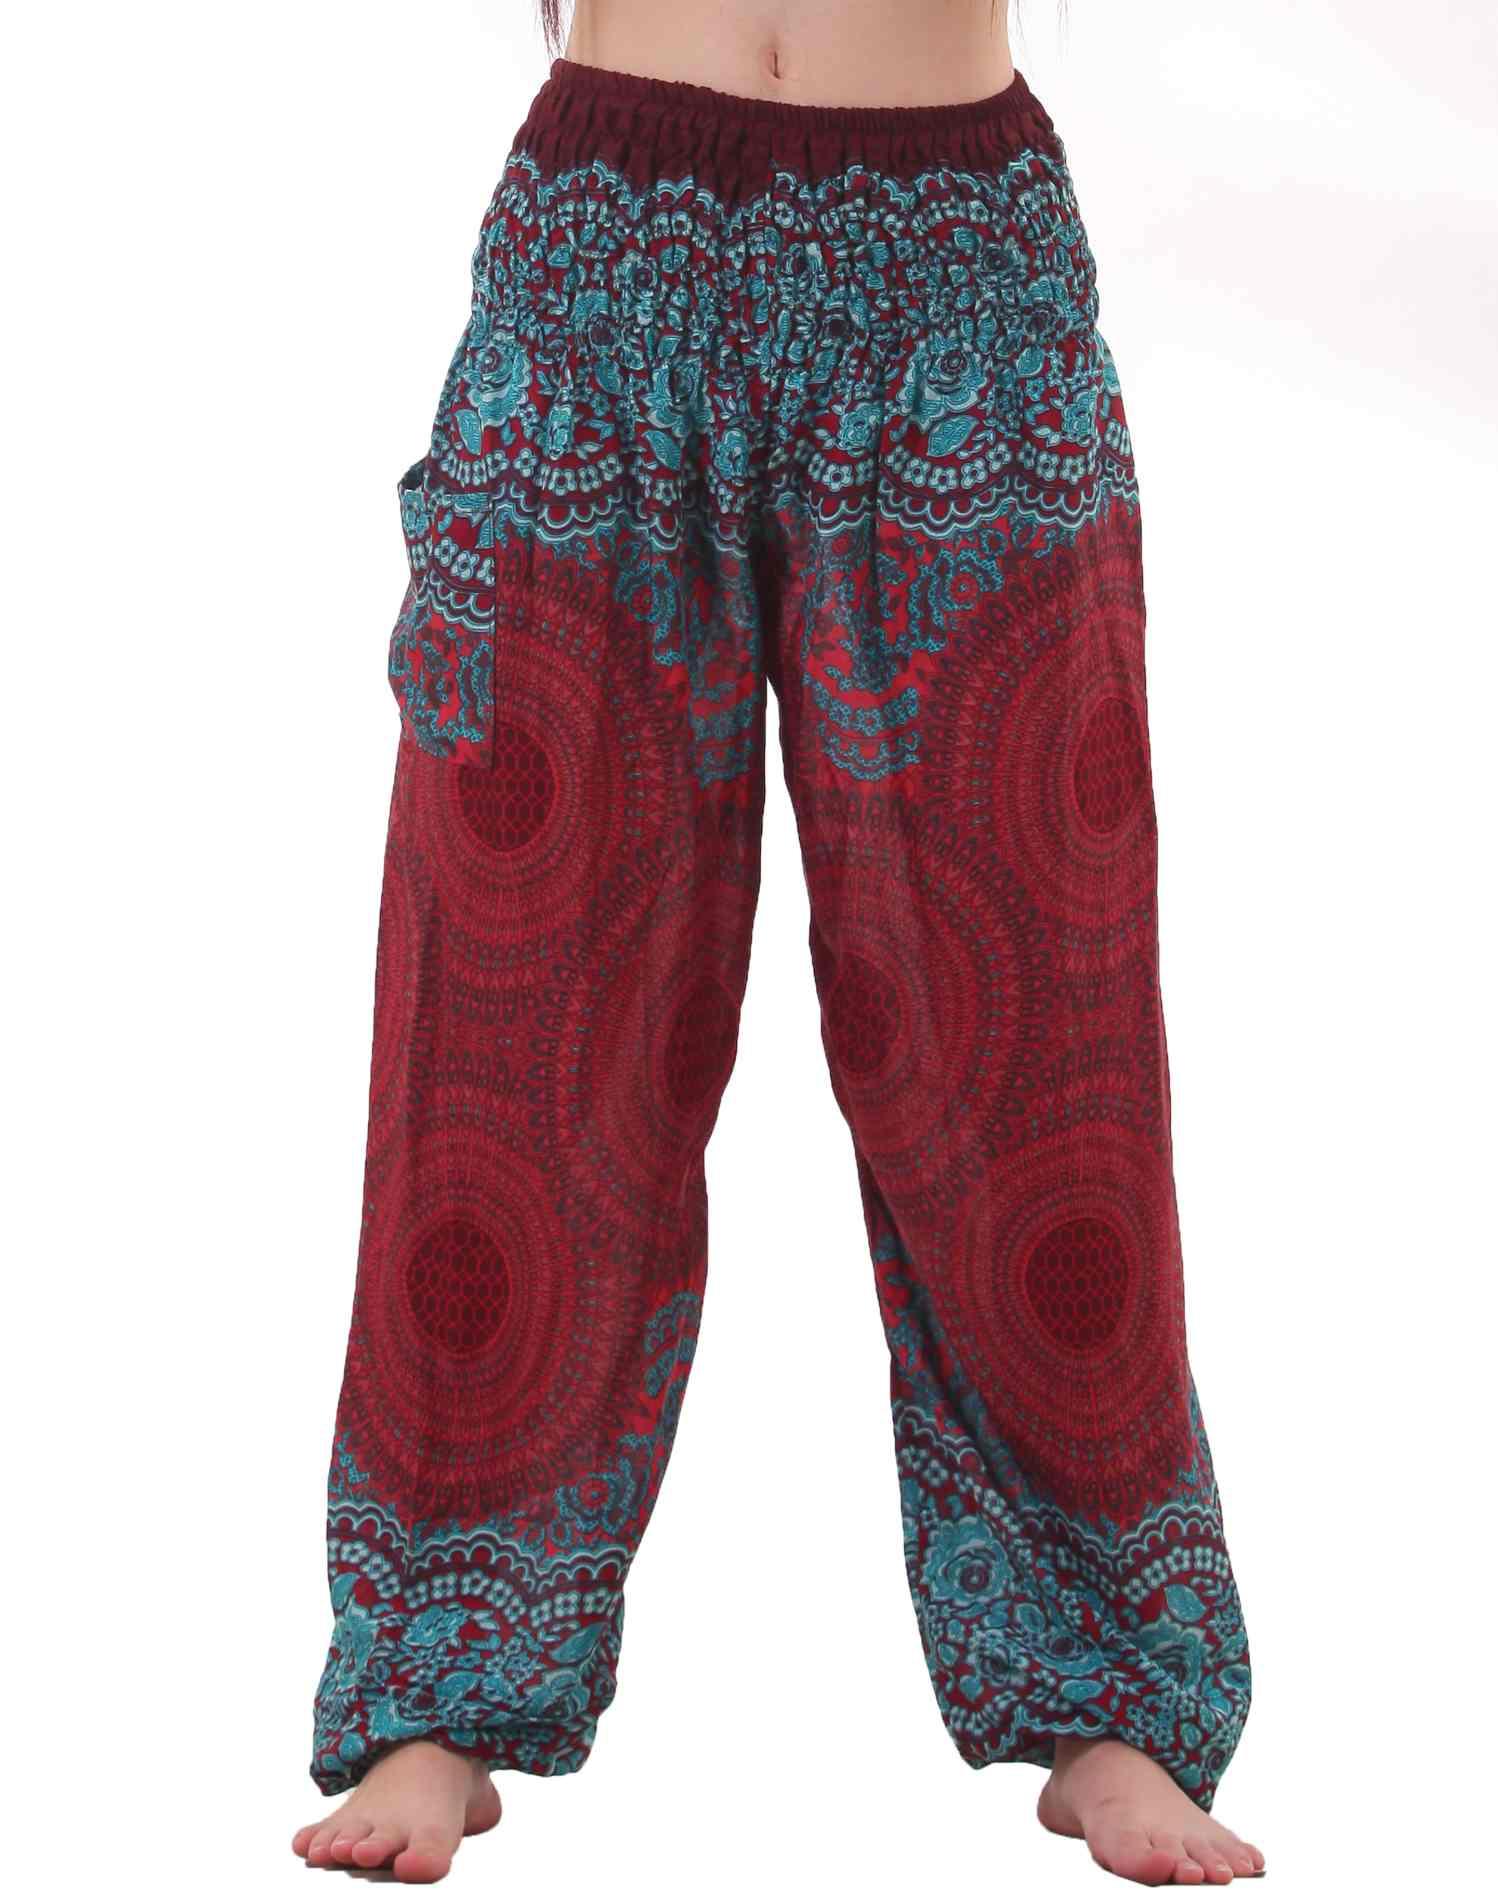 mandala harem hippie pants in red u0026 turquoise LJSHHLC